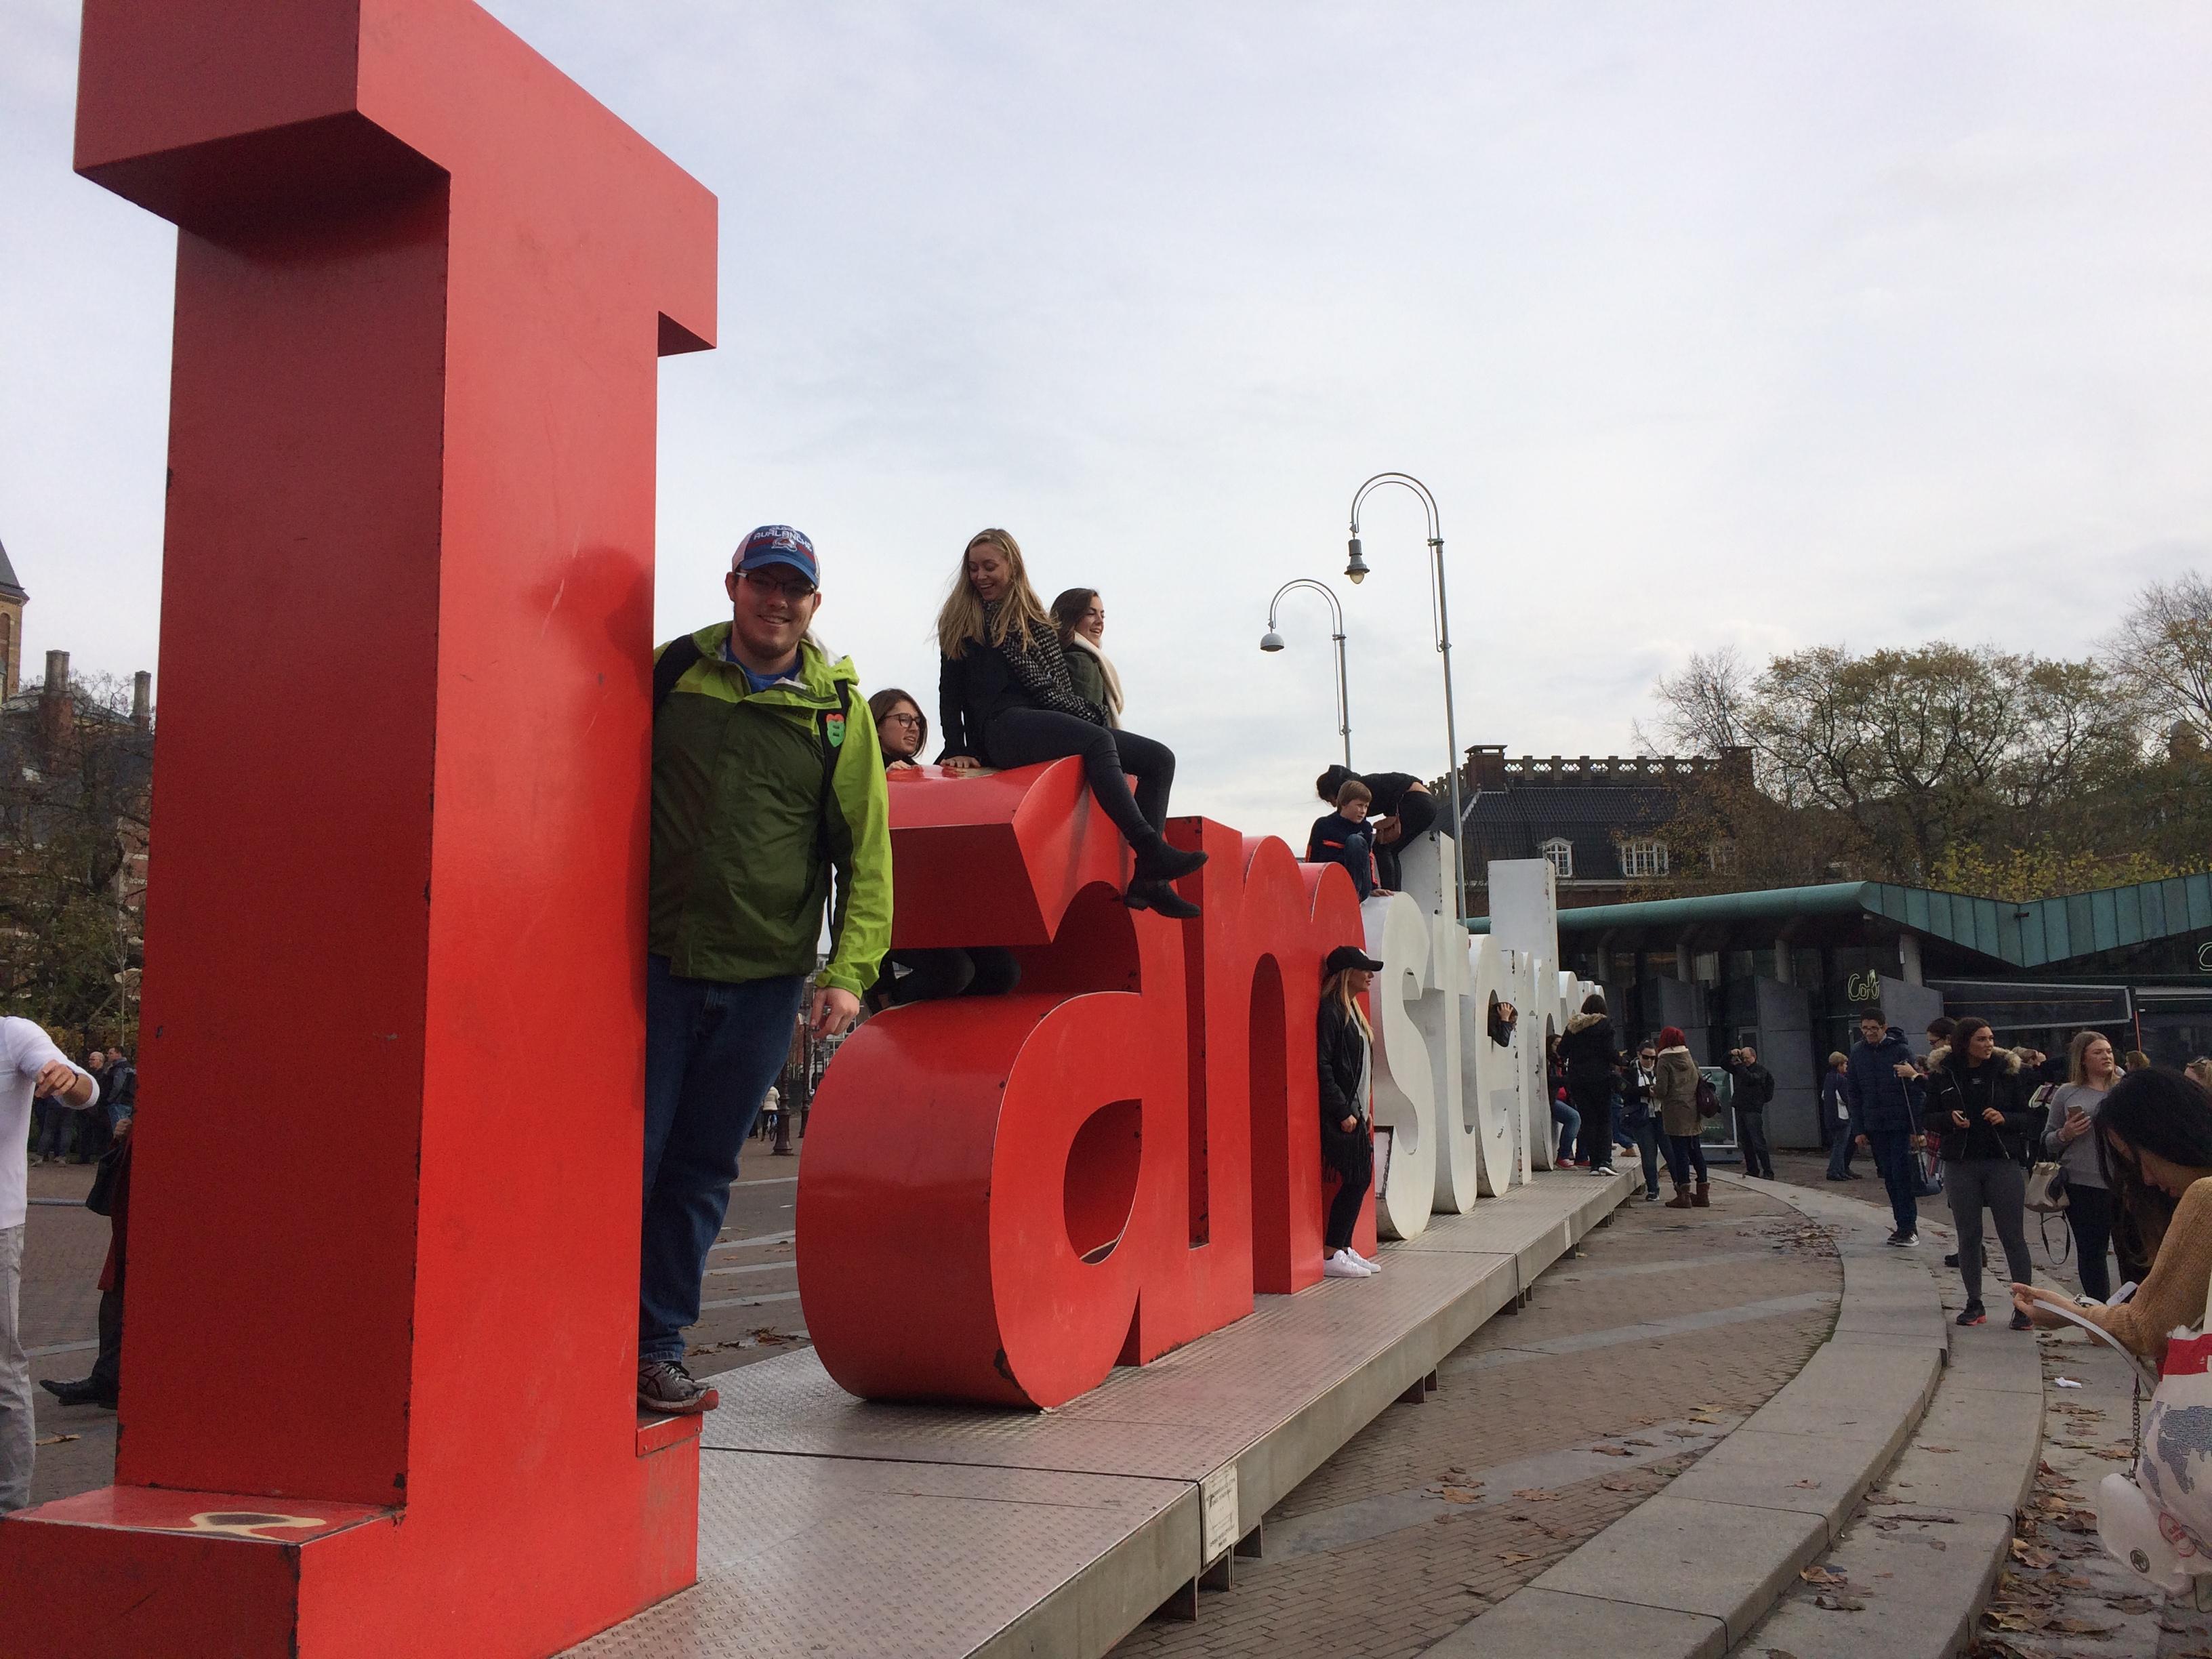 CAPAStudyAbroad_Dublin_Fall2015_From_Jeff_Vinton_-_I_Amsterdam_Sign-1.jpg